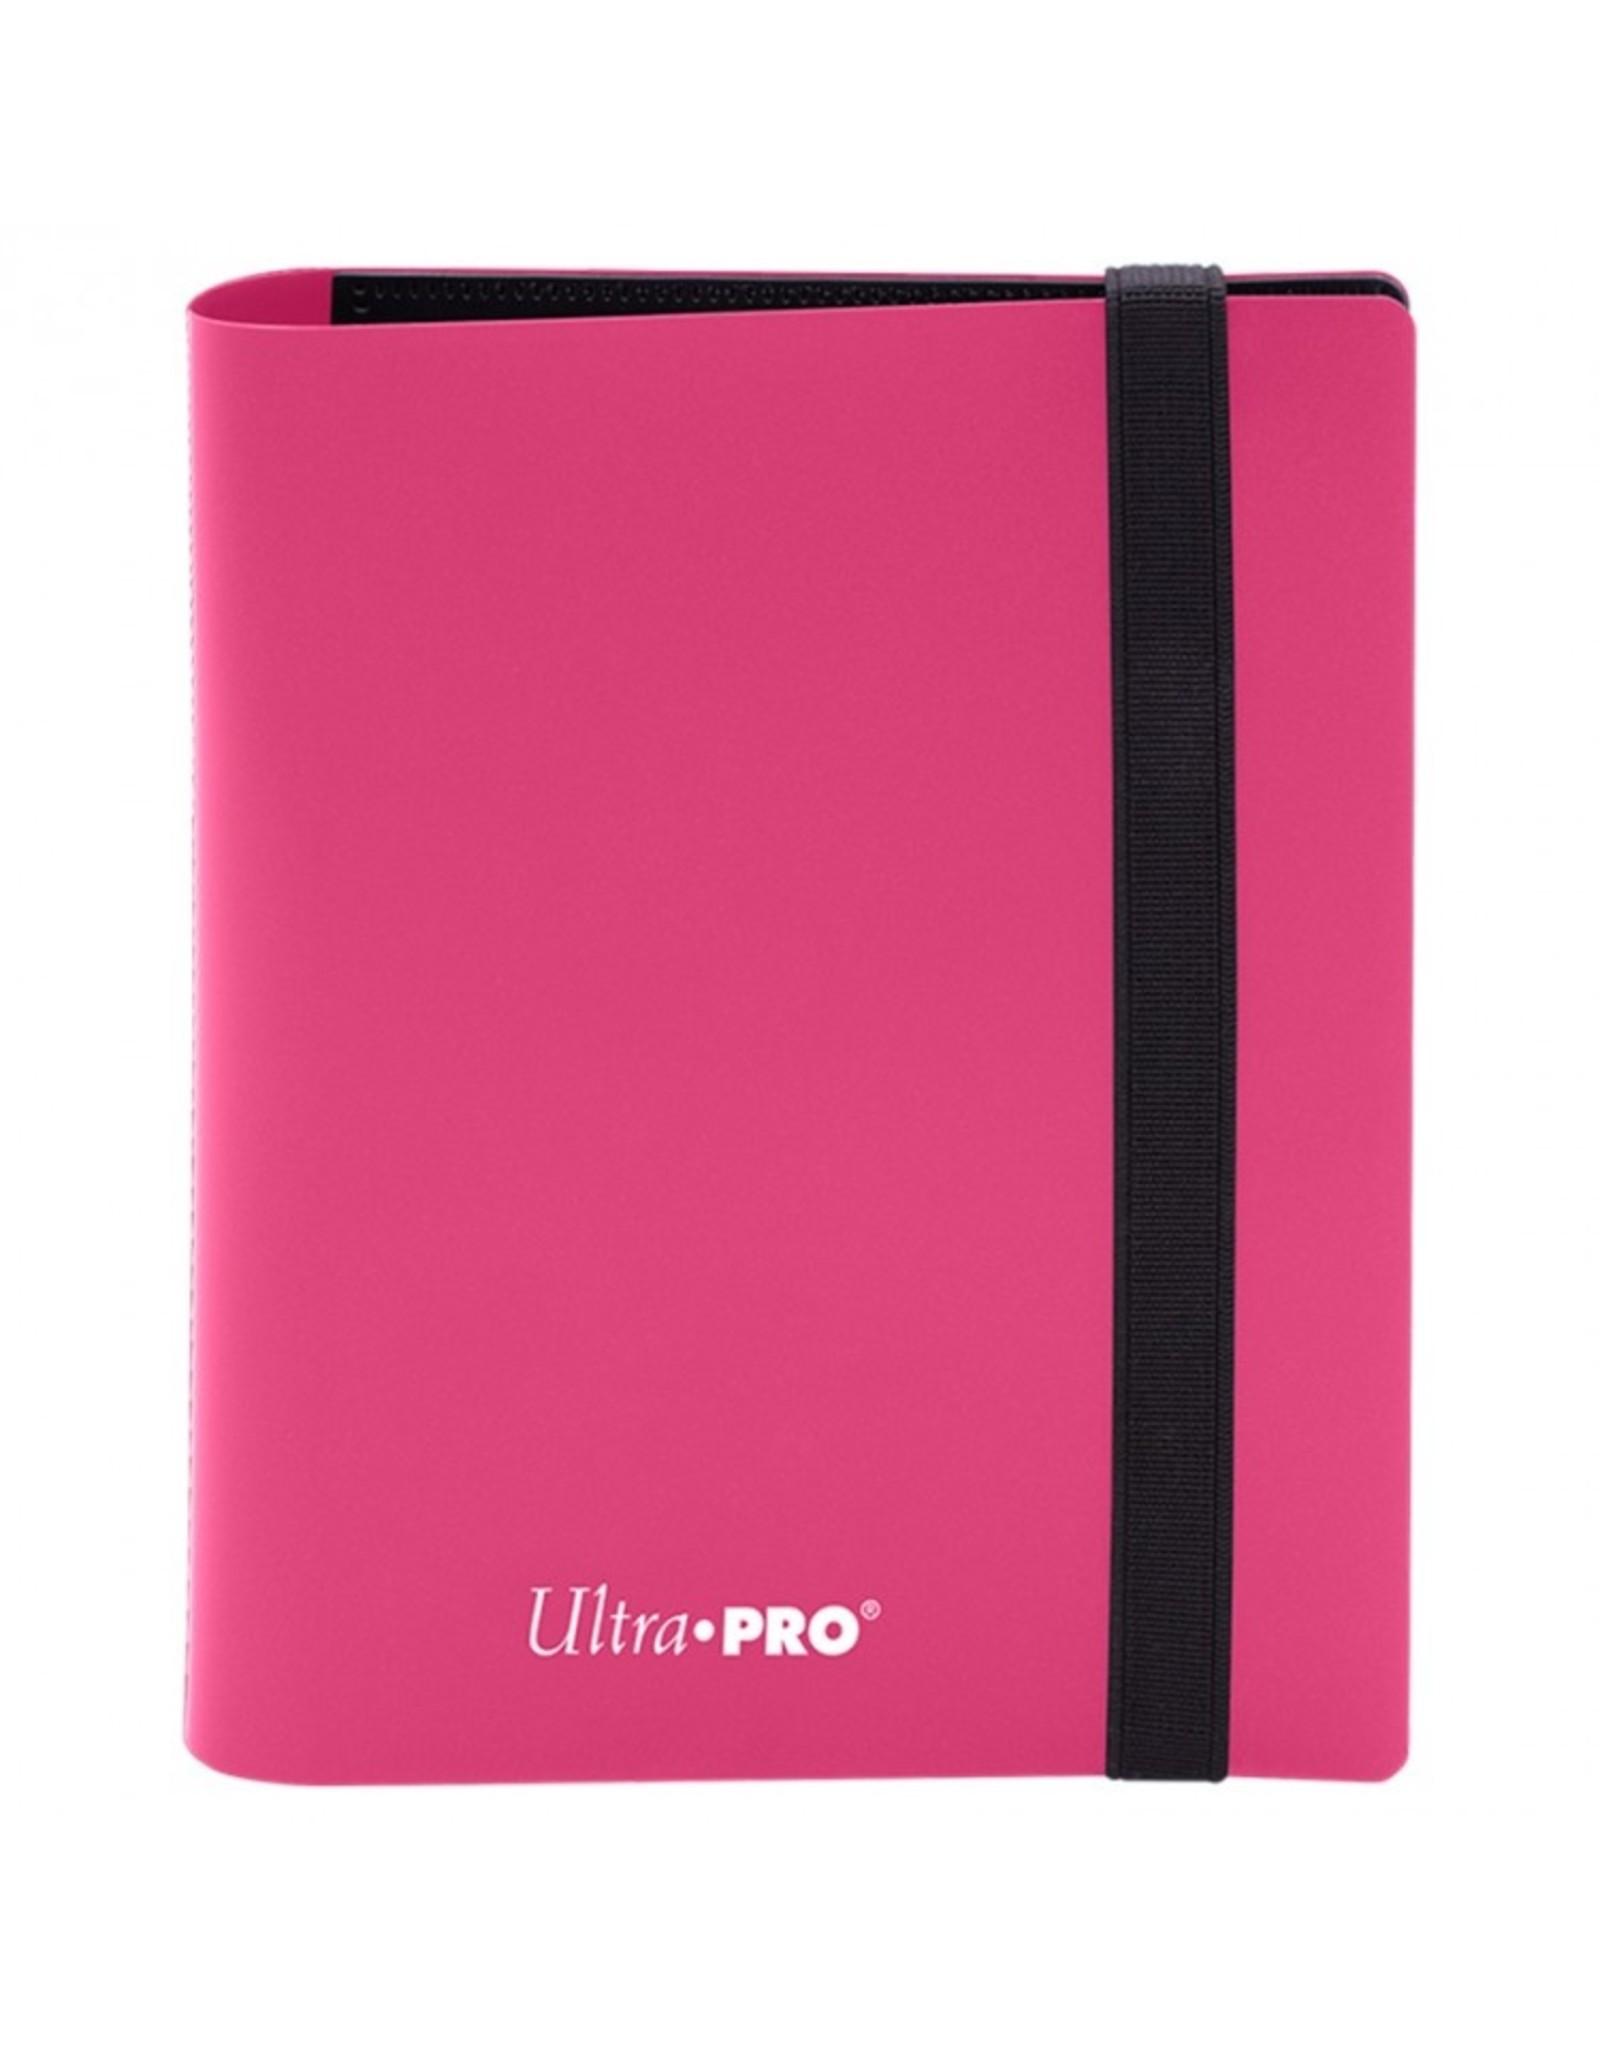 Ultra Pro Binder: 2pkt: PRO: Eclipse: Hot PK